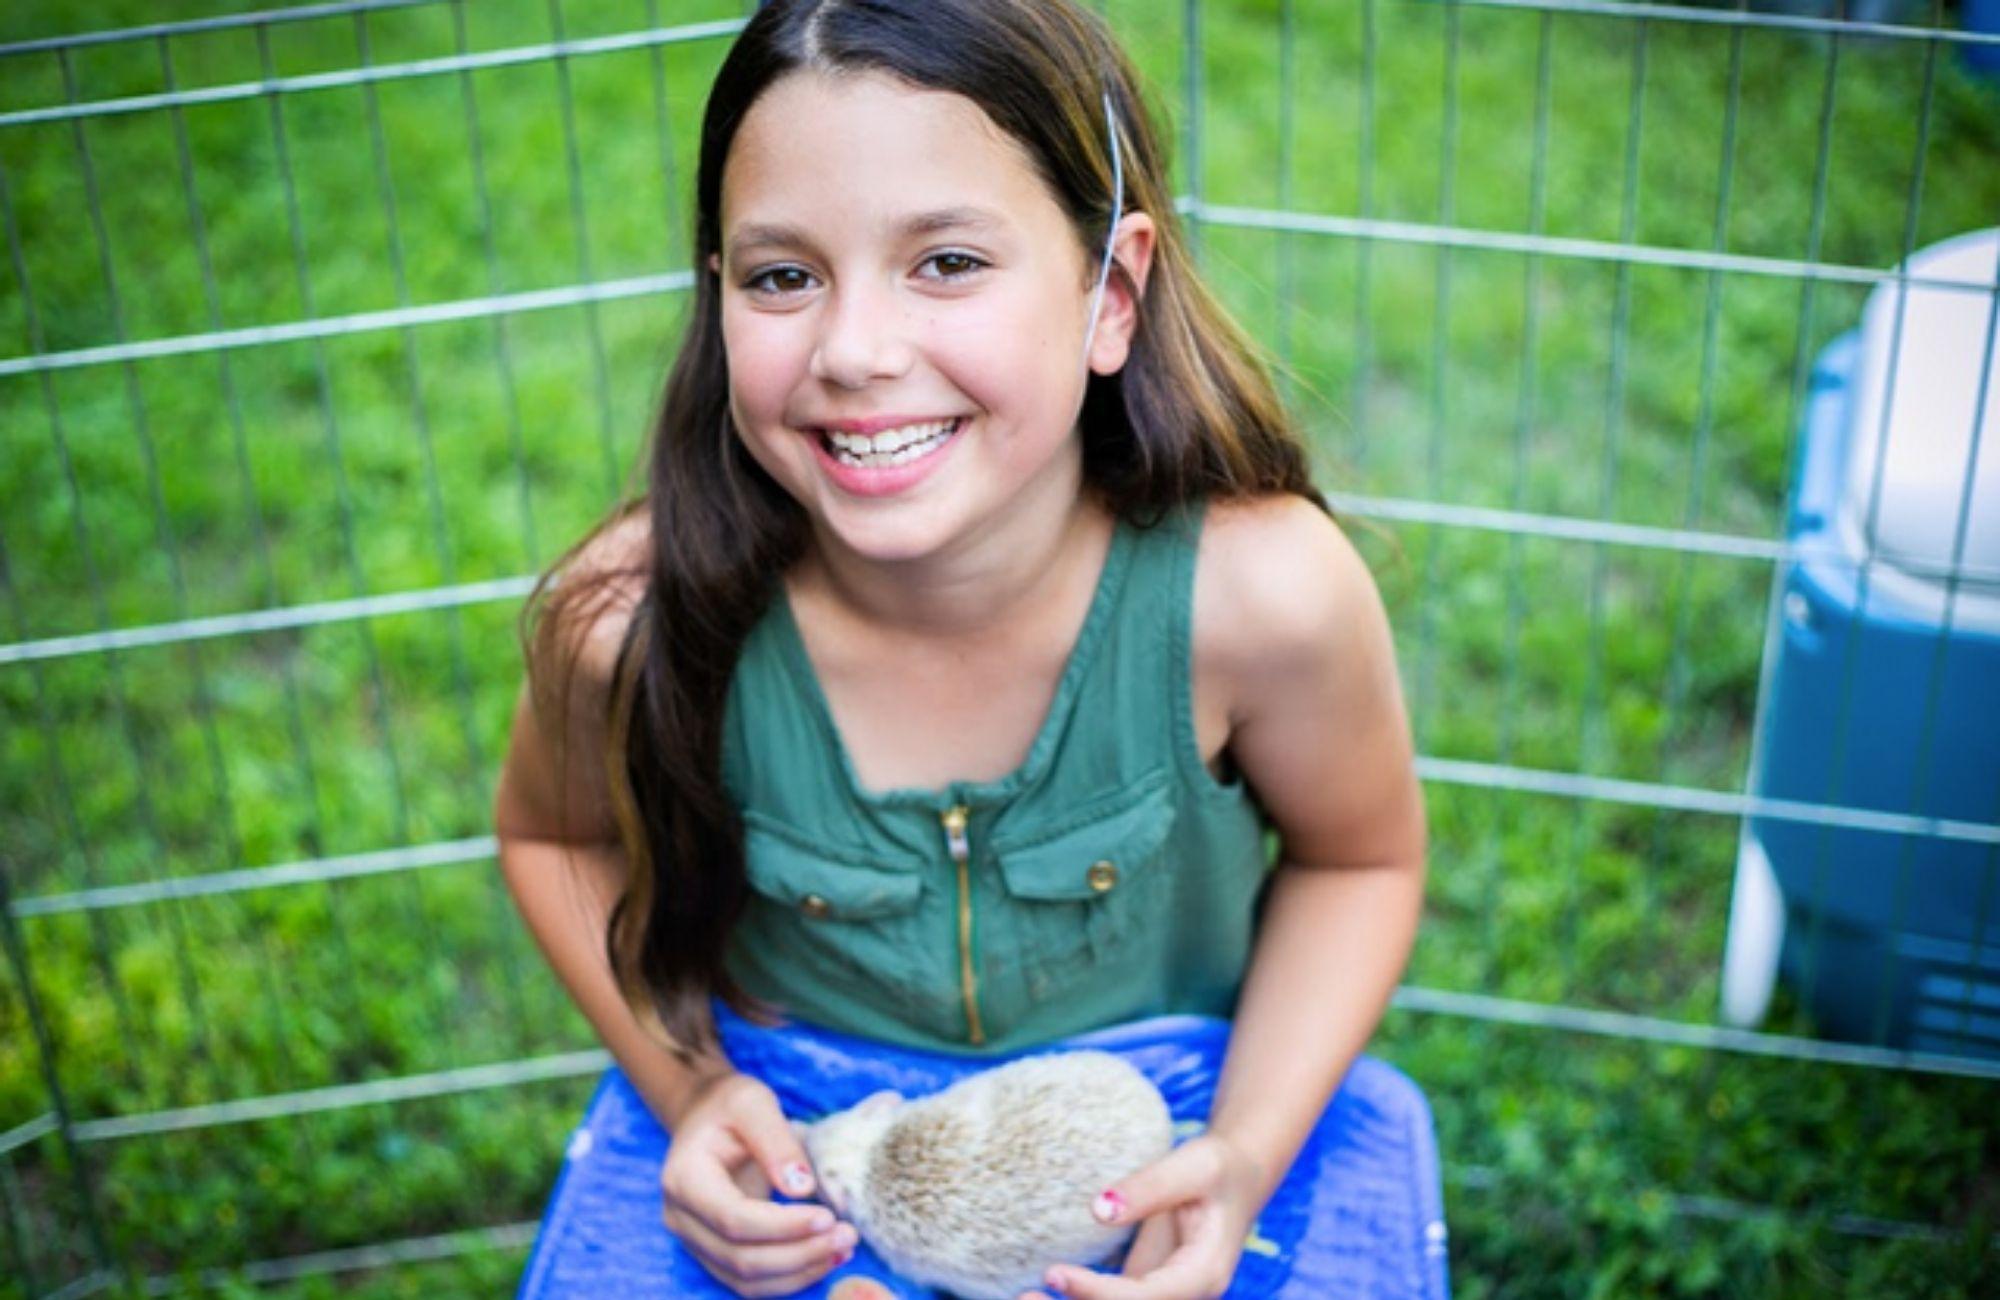 Petting Zoo Birthdays